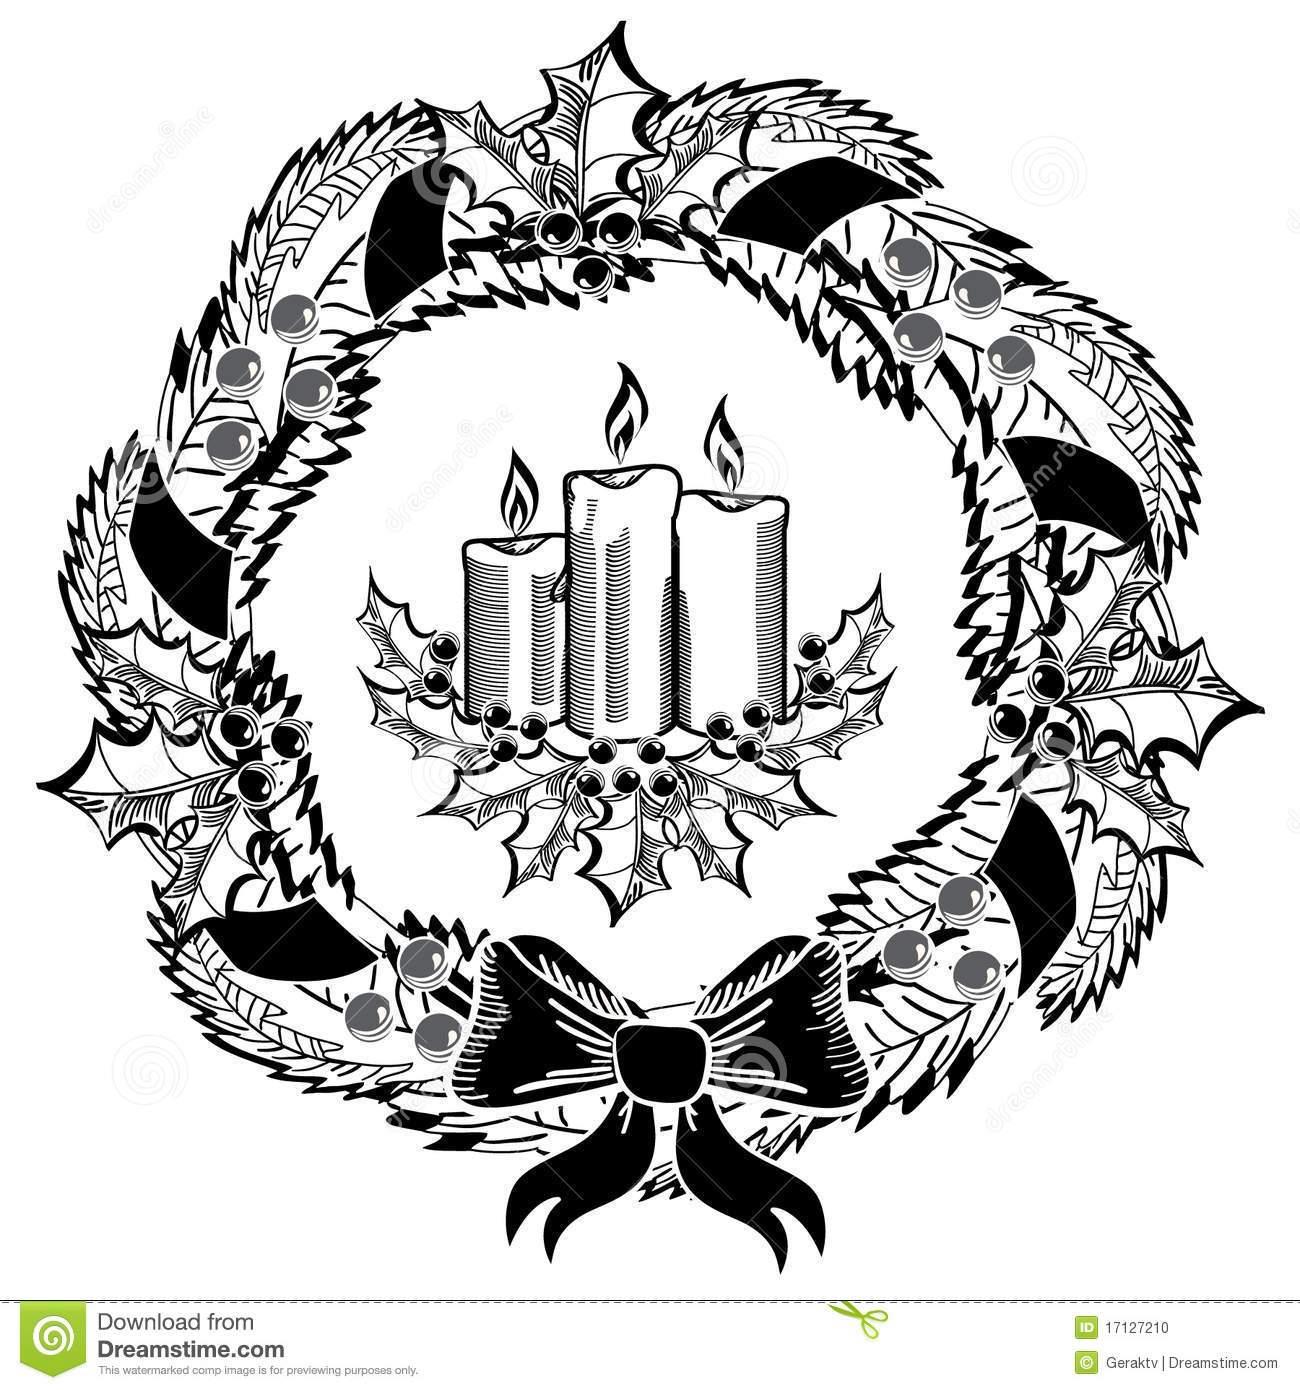 Advent clipart black and white 5 » Clipart Portal.